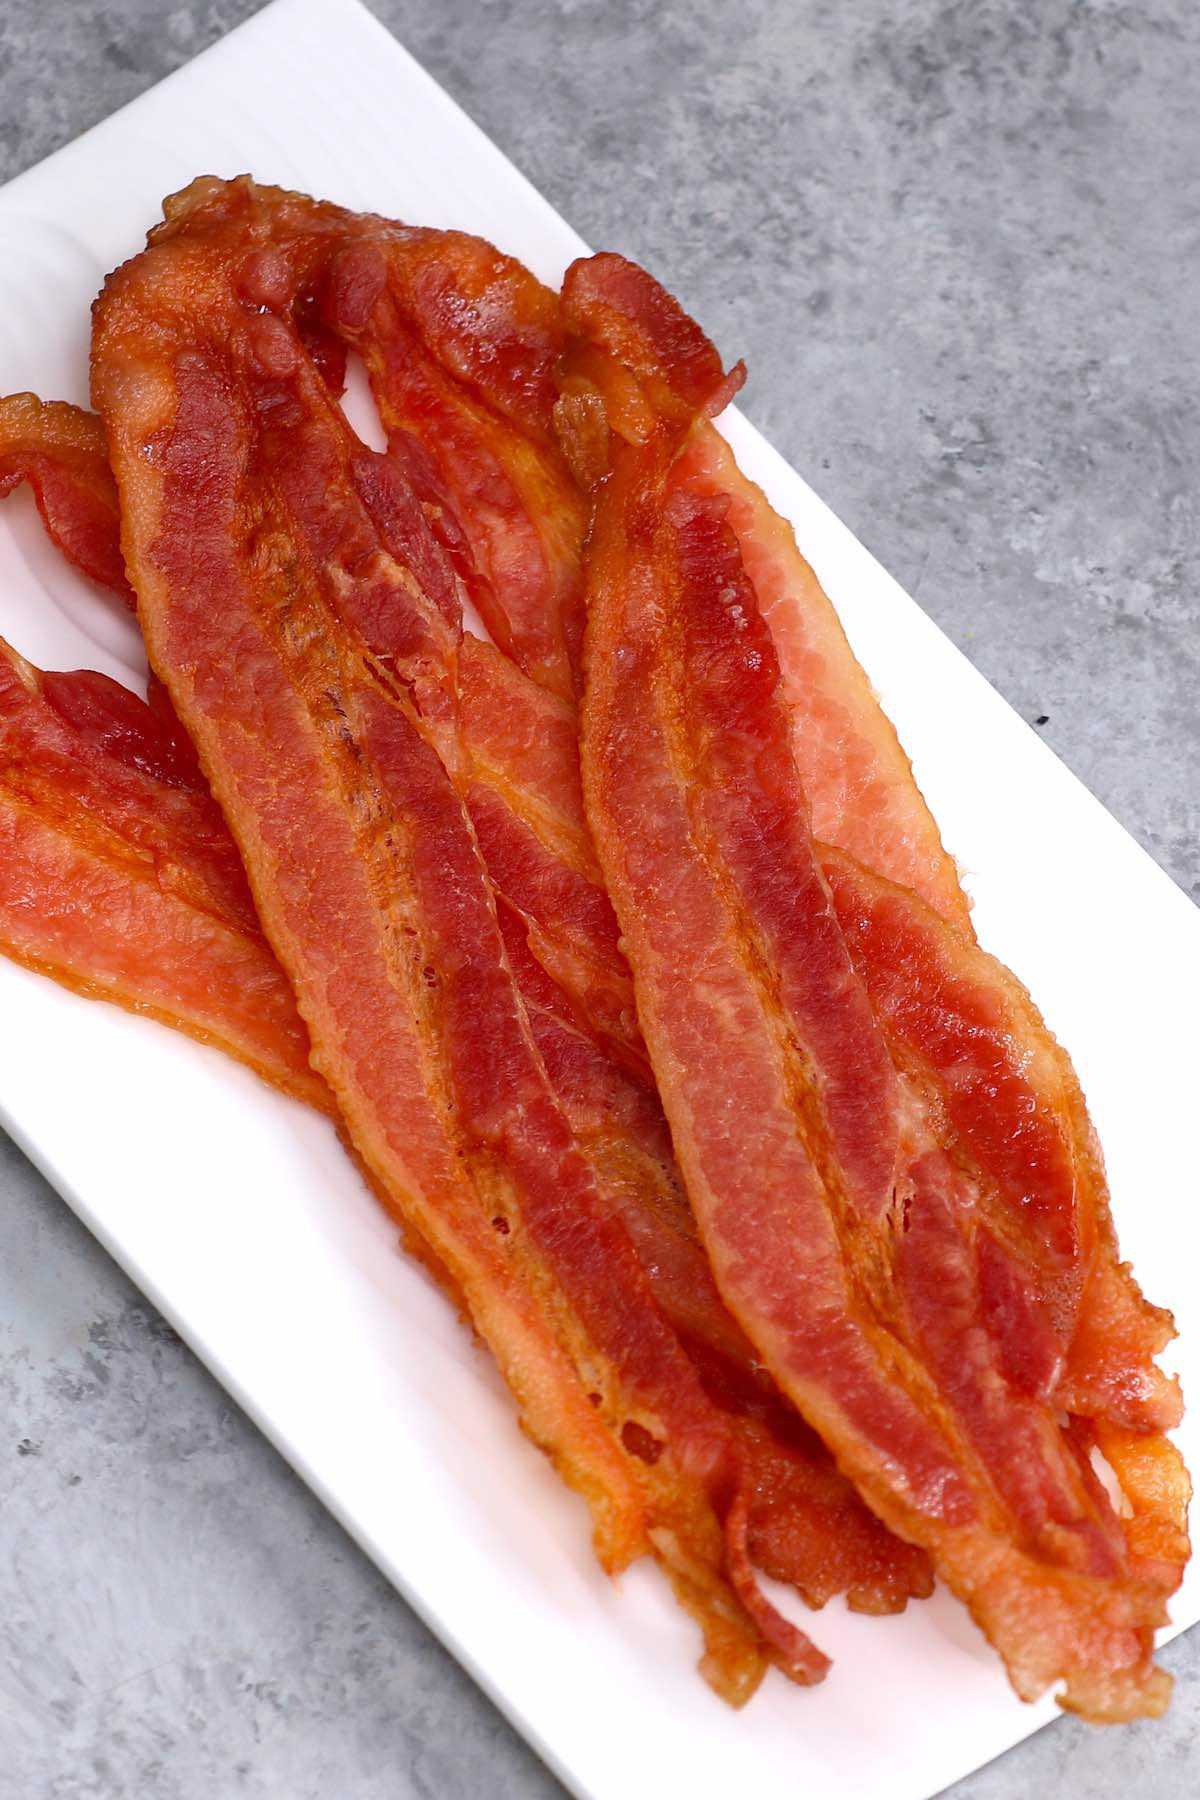 Strips of crispy microwaved bacon on a serving plate #microwavebacon